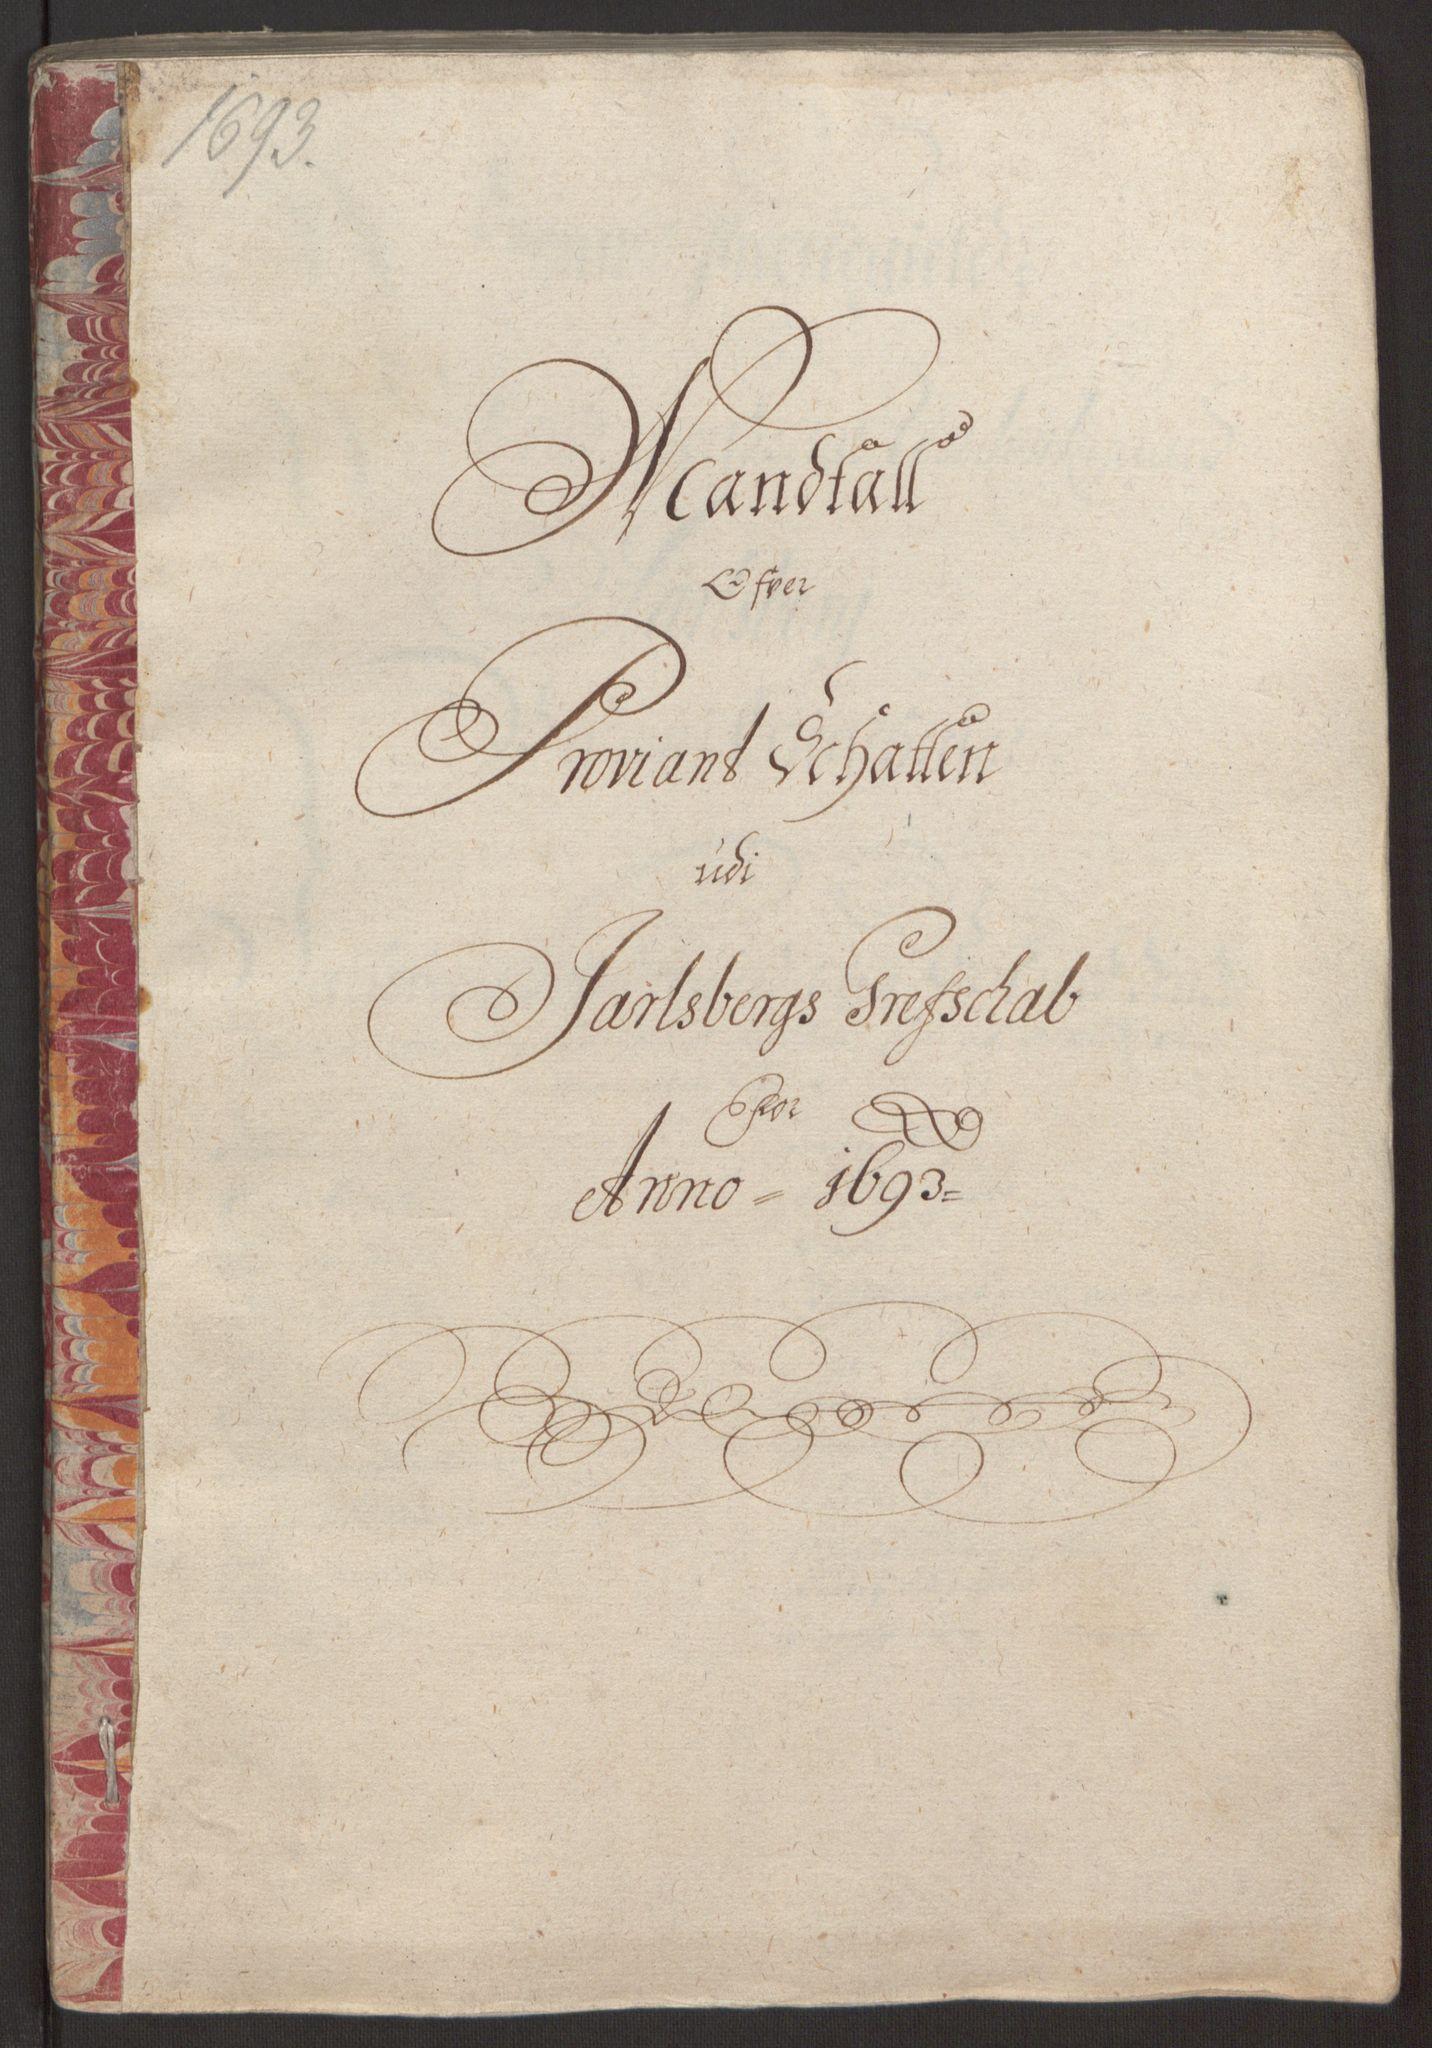 RA, Rentekammeret inntil 1814, Reviderte regnskaper, Fogderegnskap, R32/L1866: Fogderegnskap Jarlsberg grevskap, 1693, s. 84